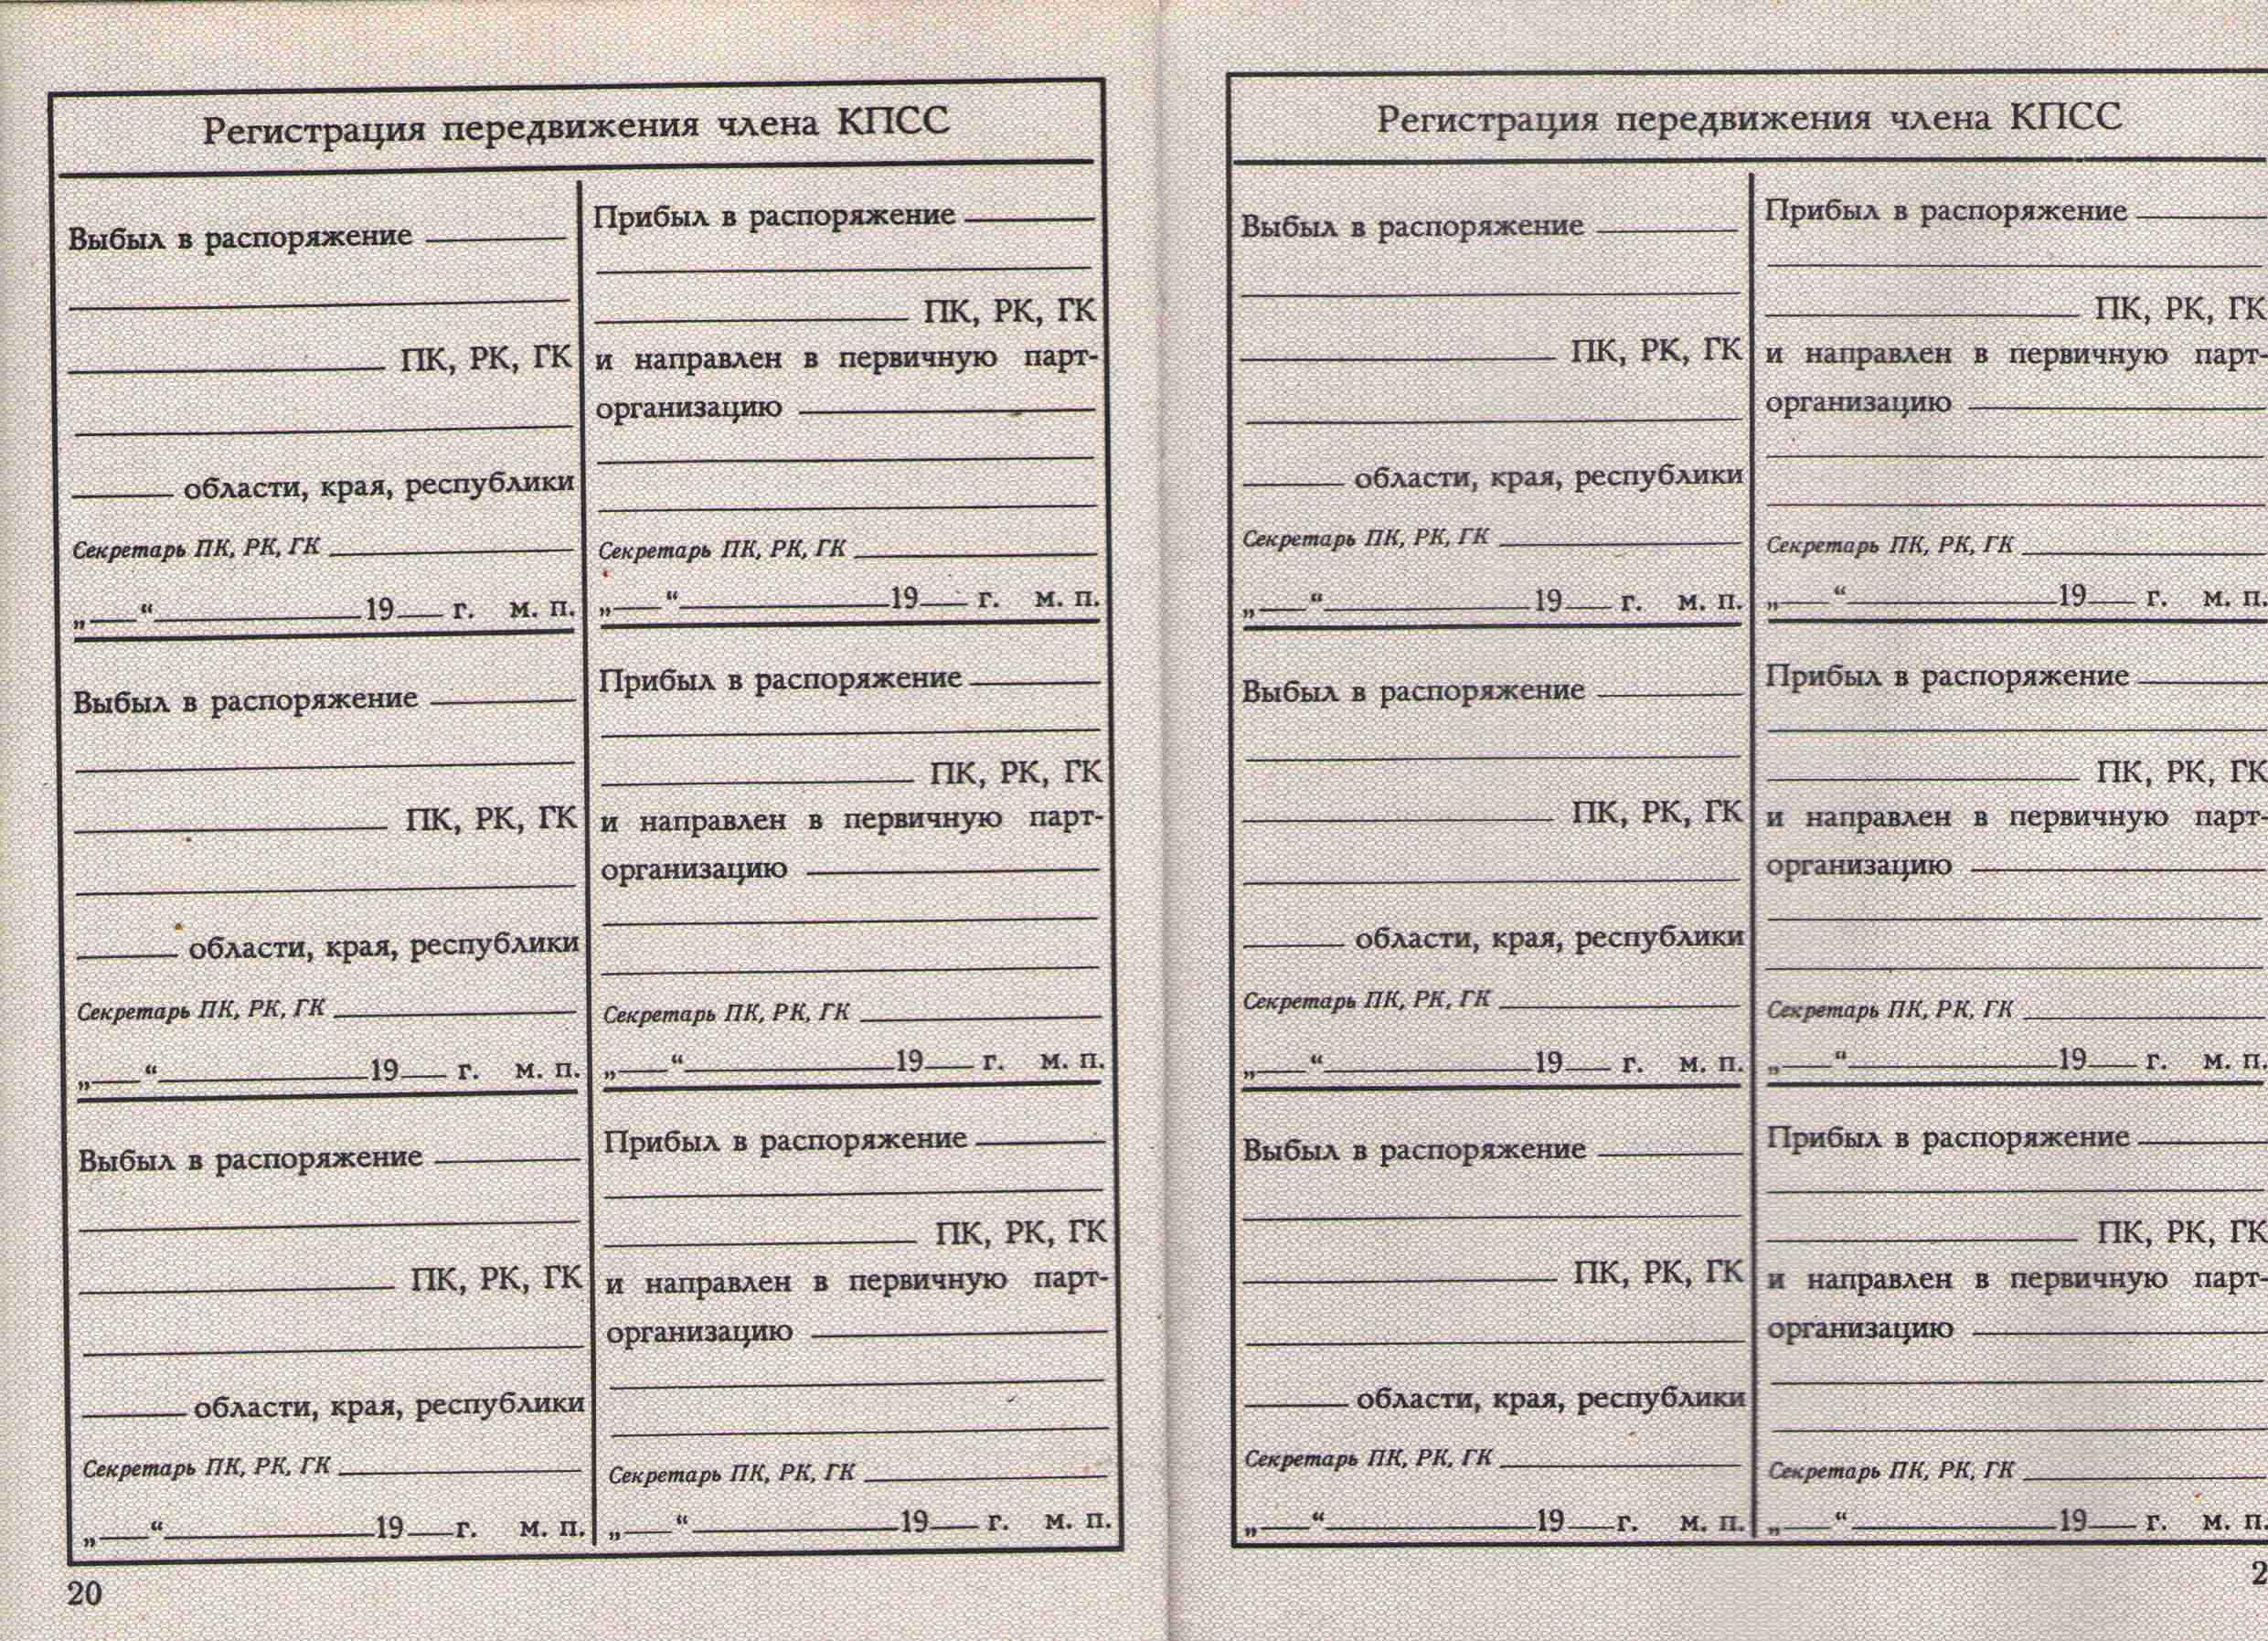 89. Учетная карточка члена партии Барыкина ПП, 1974.